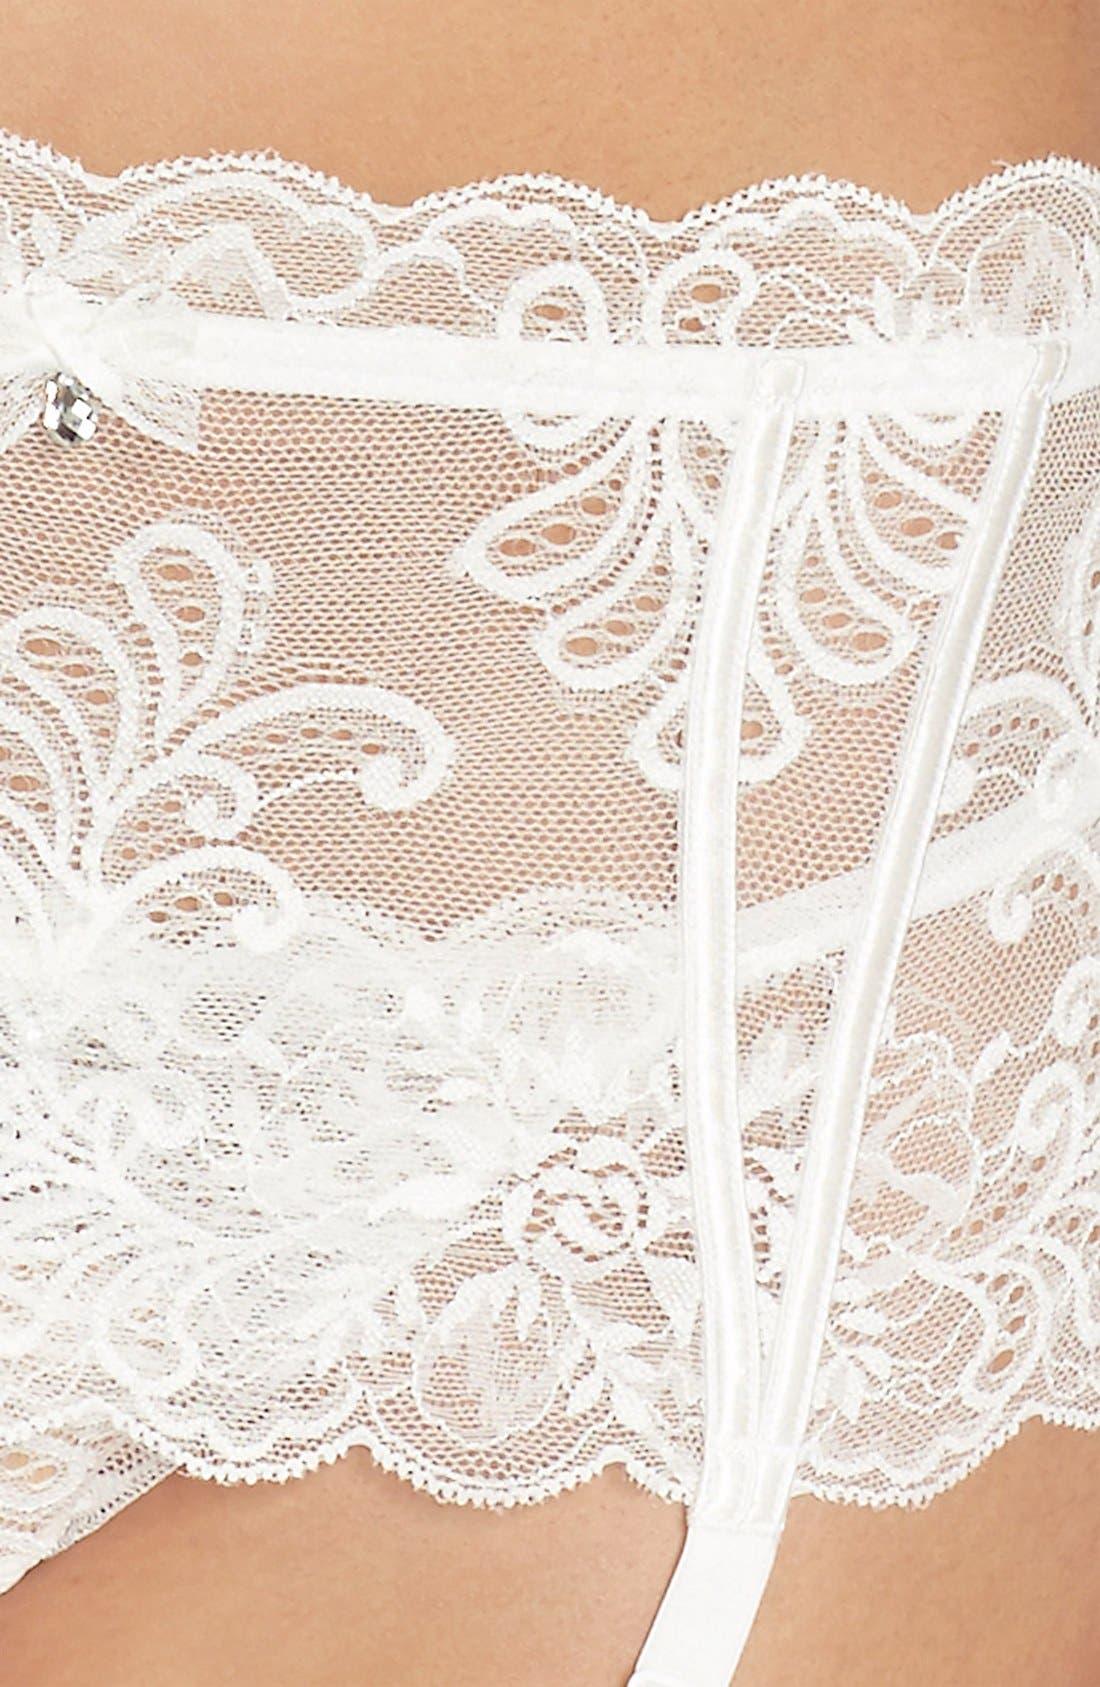 Le Mysère 'Sophia' Lace Garter Belt,                             Alternate thumbnail 15, color,